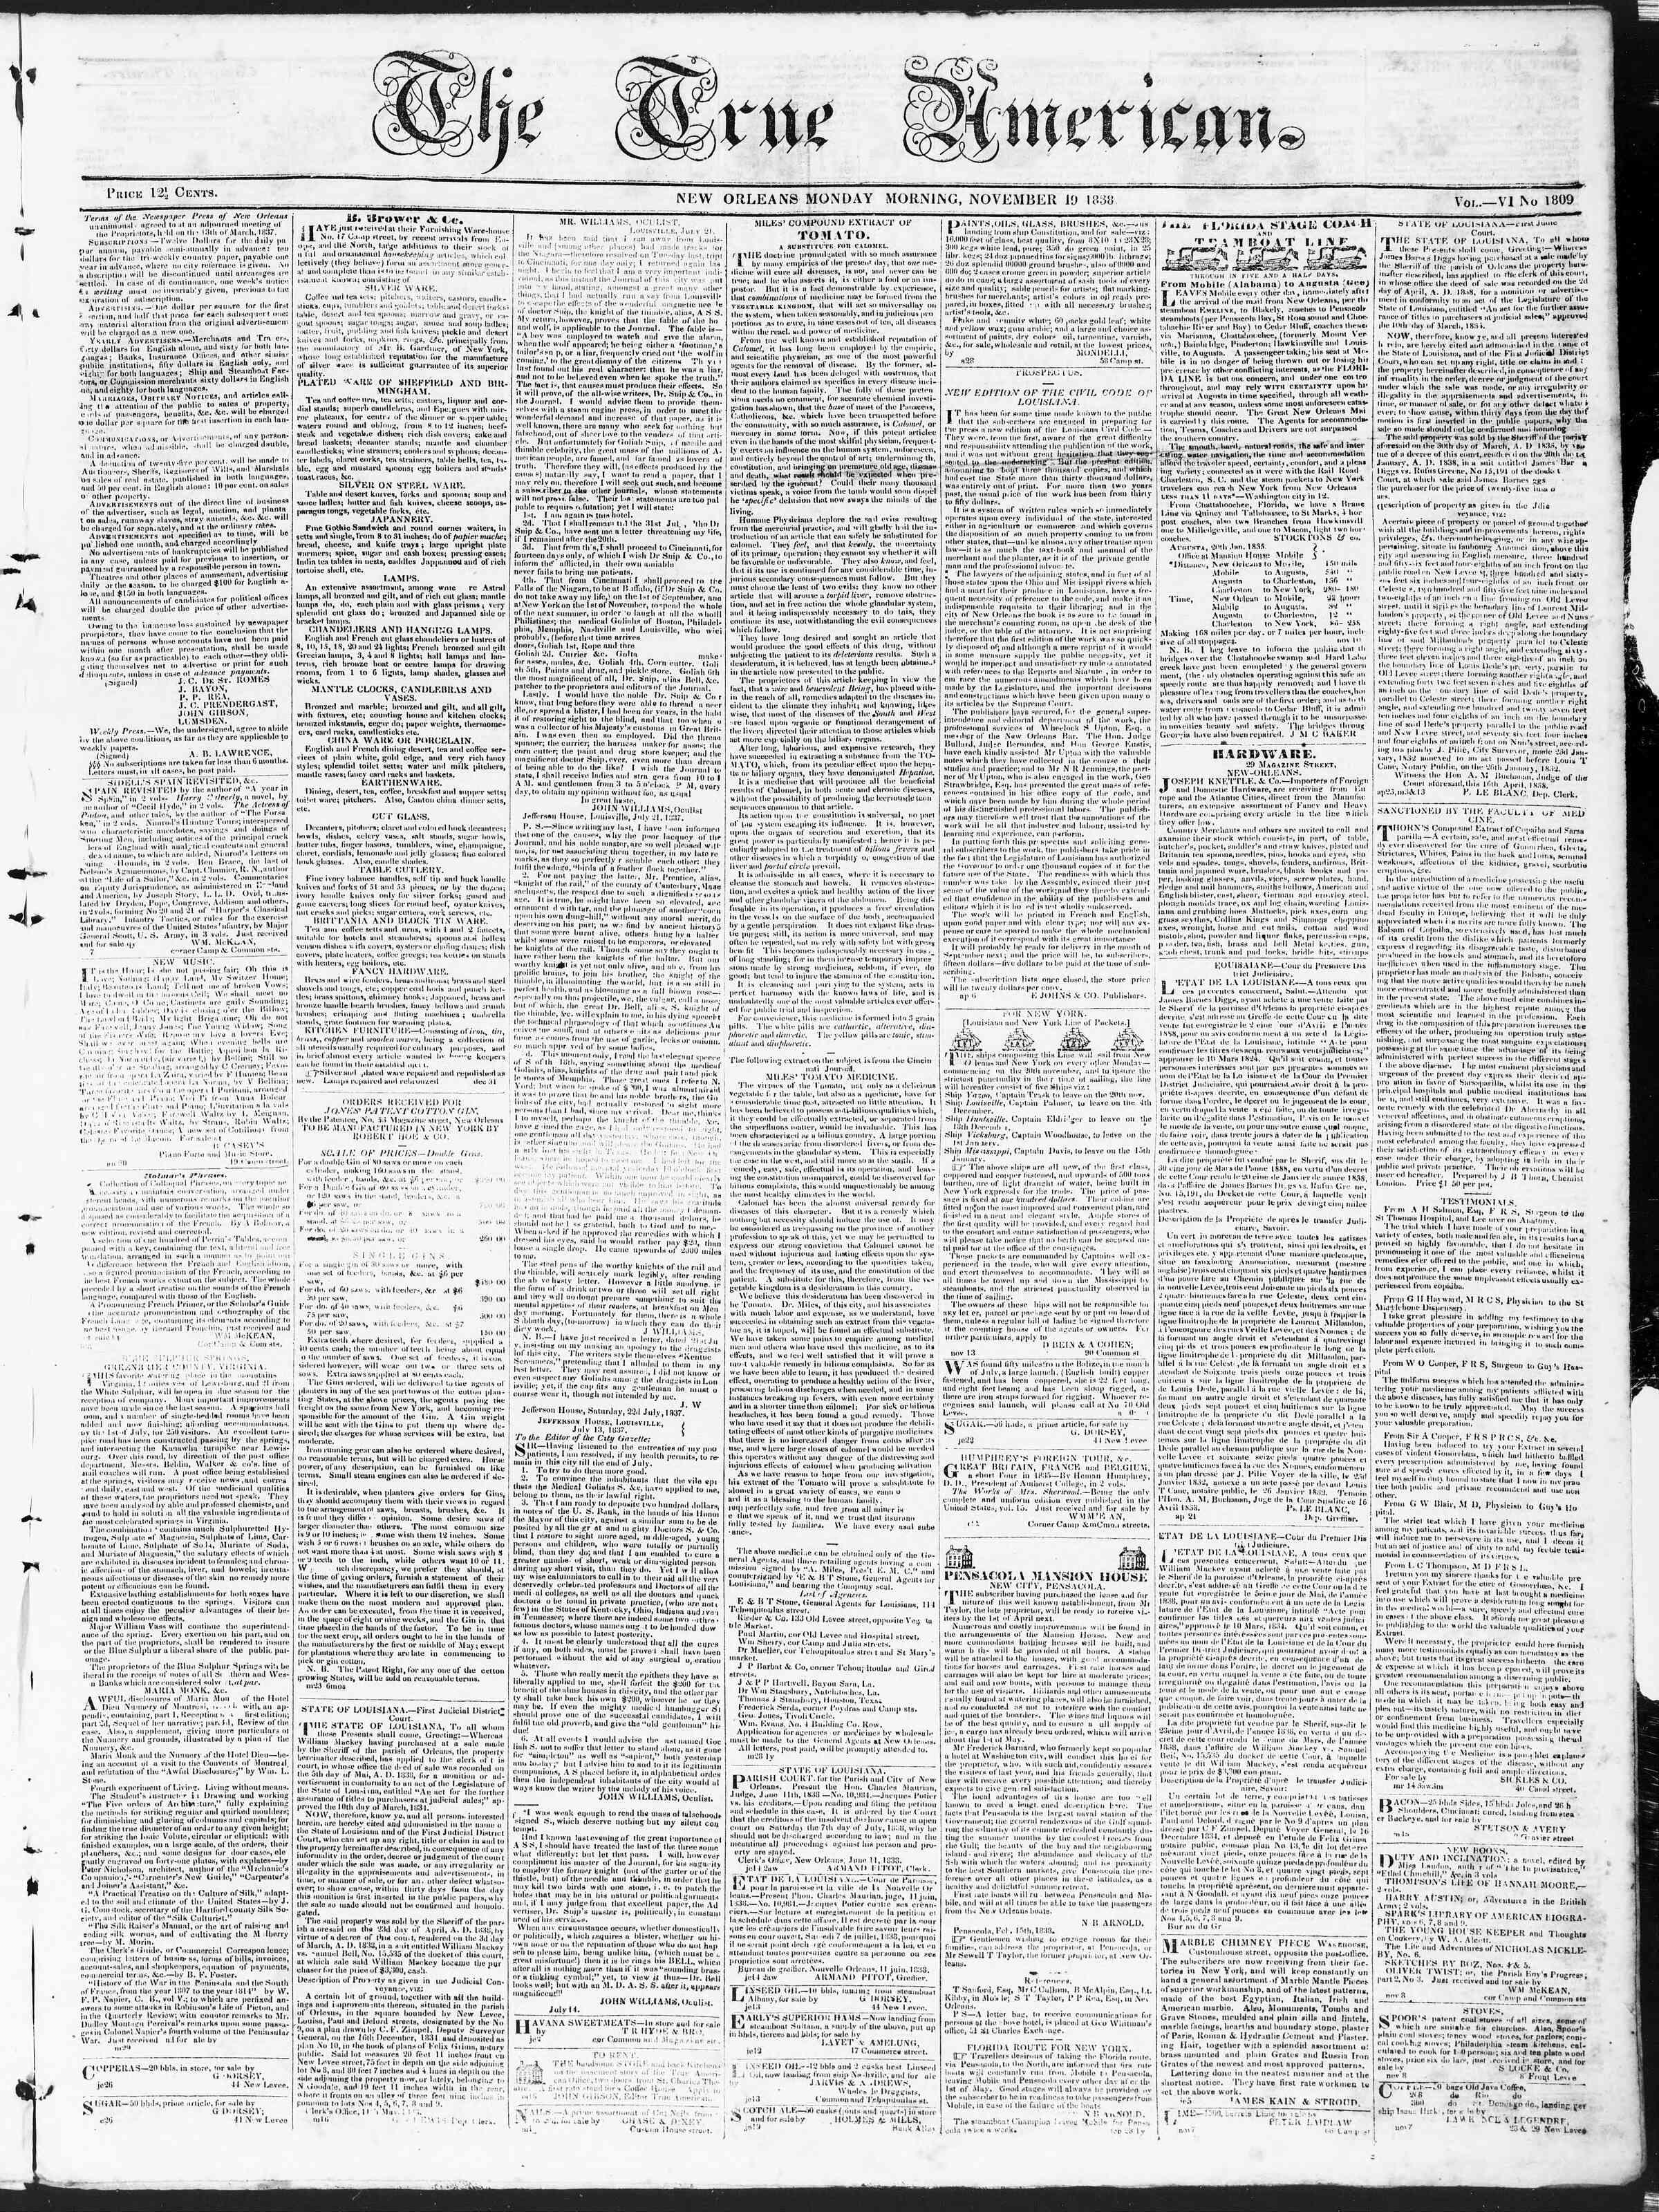 November 19, 1838 Tarihli True American Gazetesi Sayfa 1